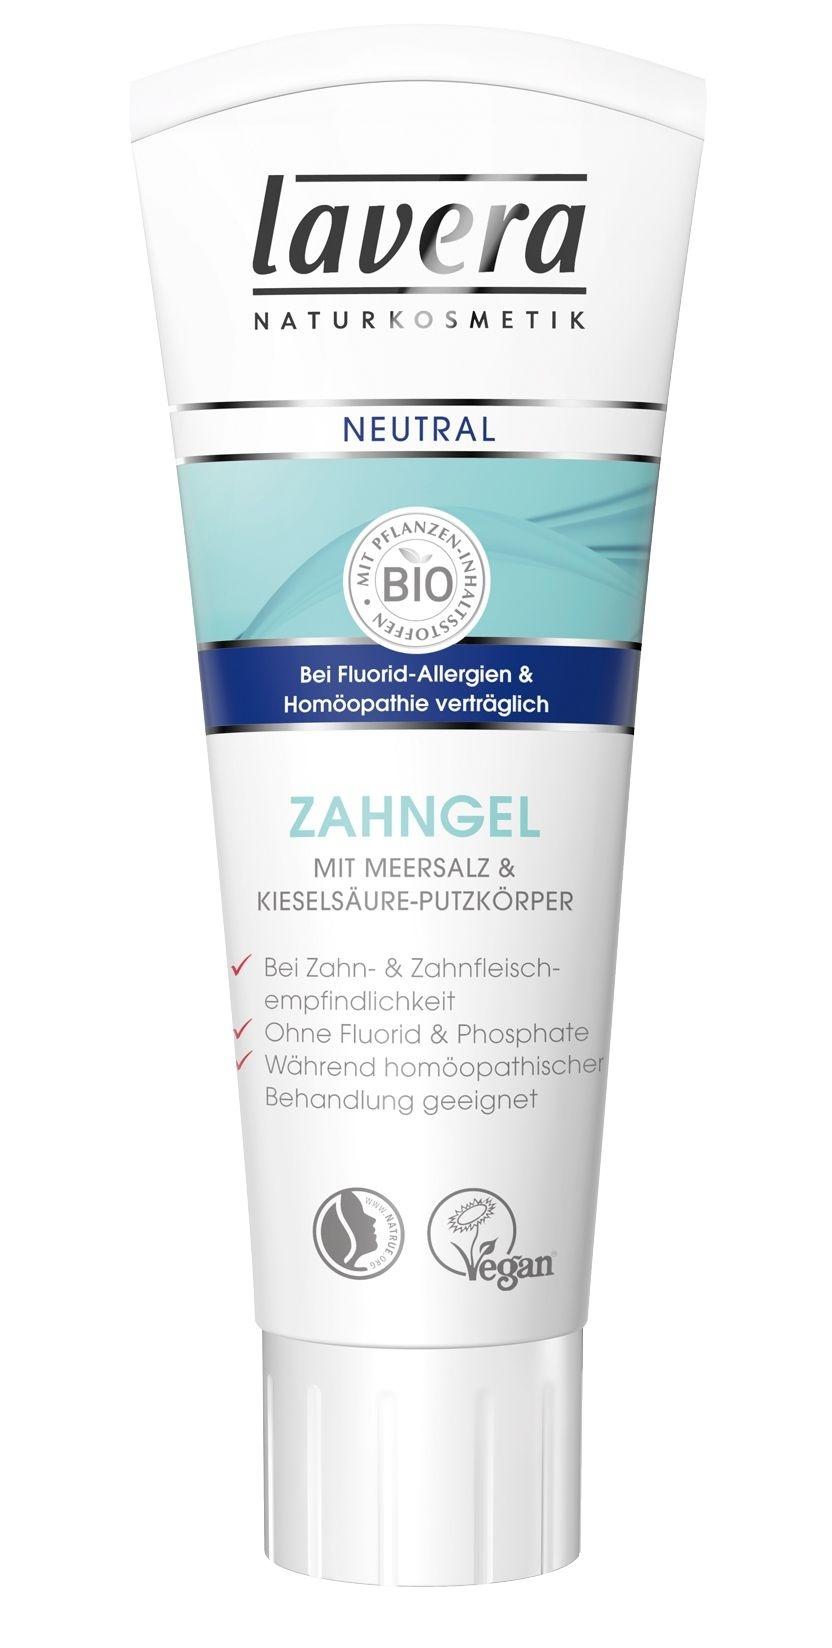 Lavera Basis Neutral Gel Toothpaste Gentle cleanser for sensitive teeth 75ml